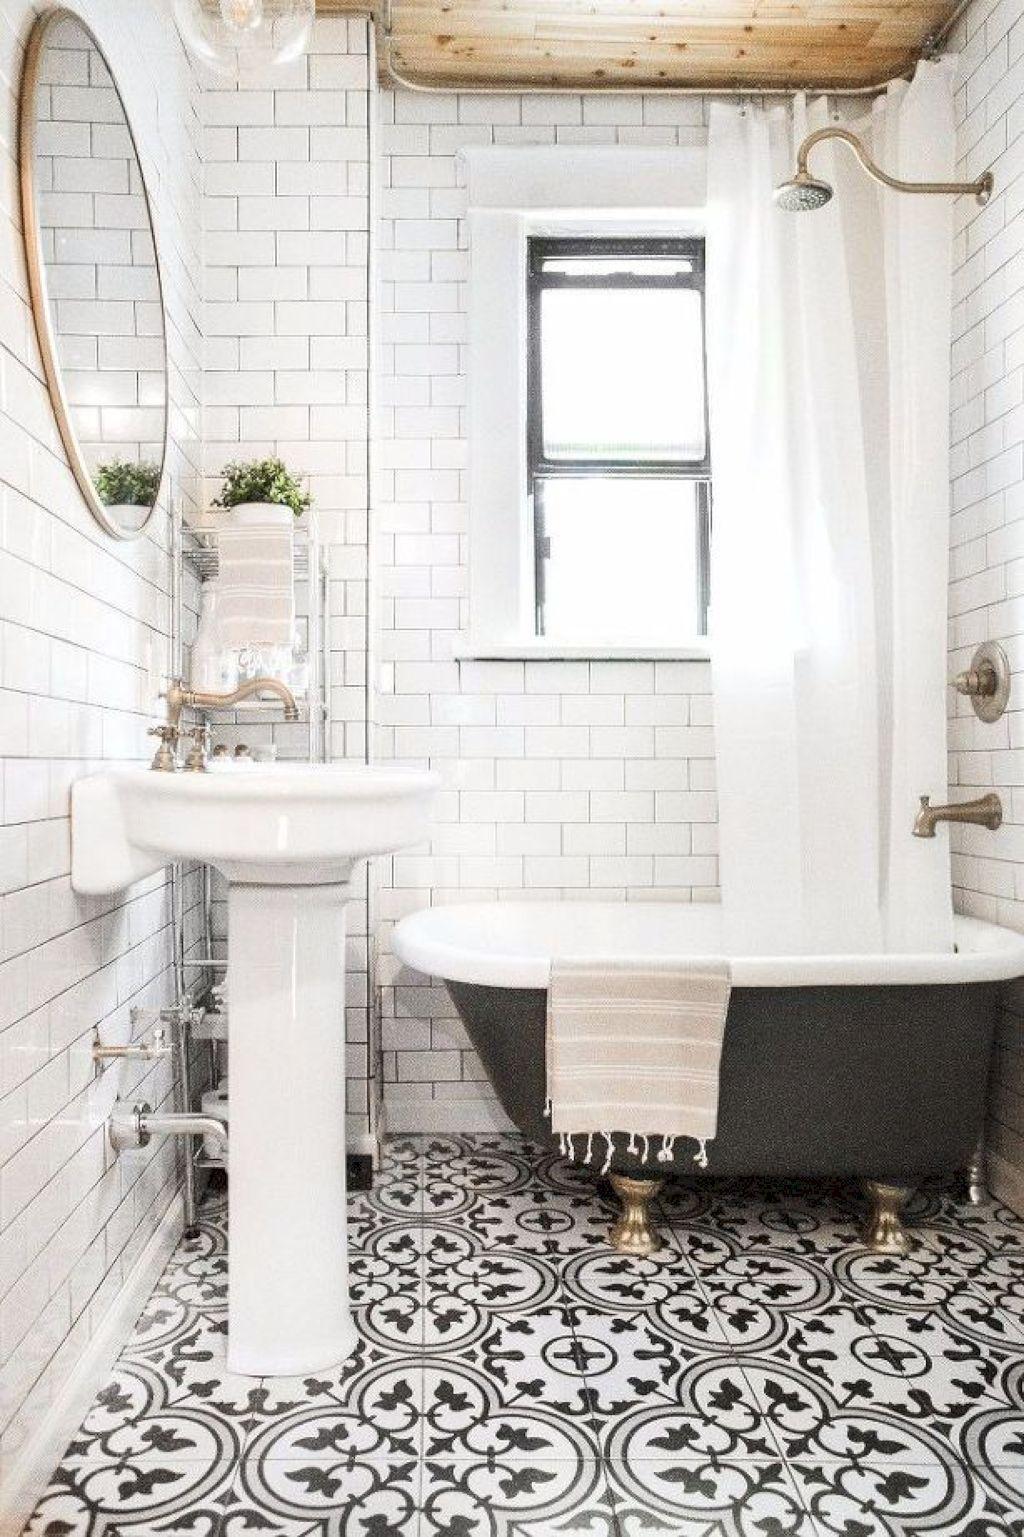 Small Bathroom Ideas 52 Black White Bathrooms Bathroom Trends Small Bathroom